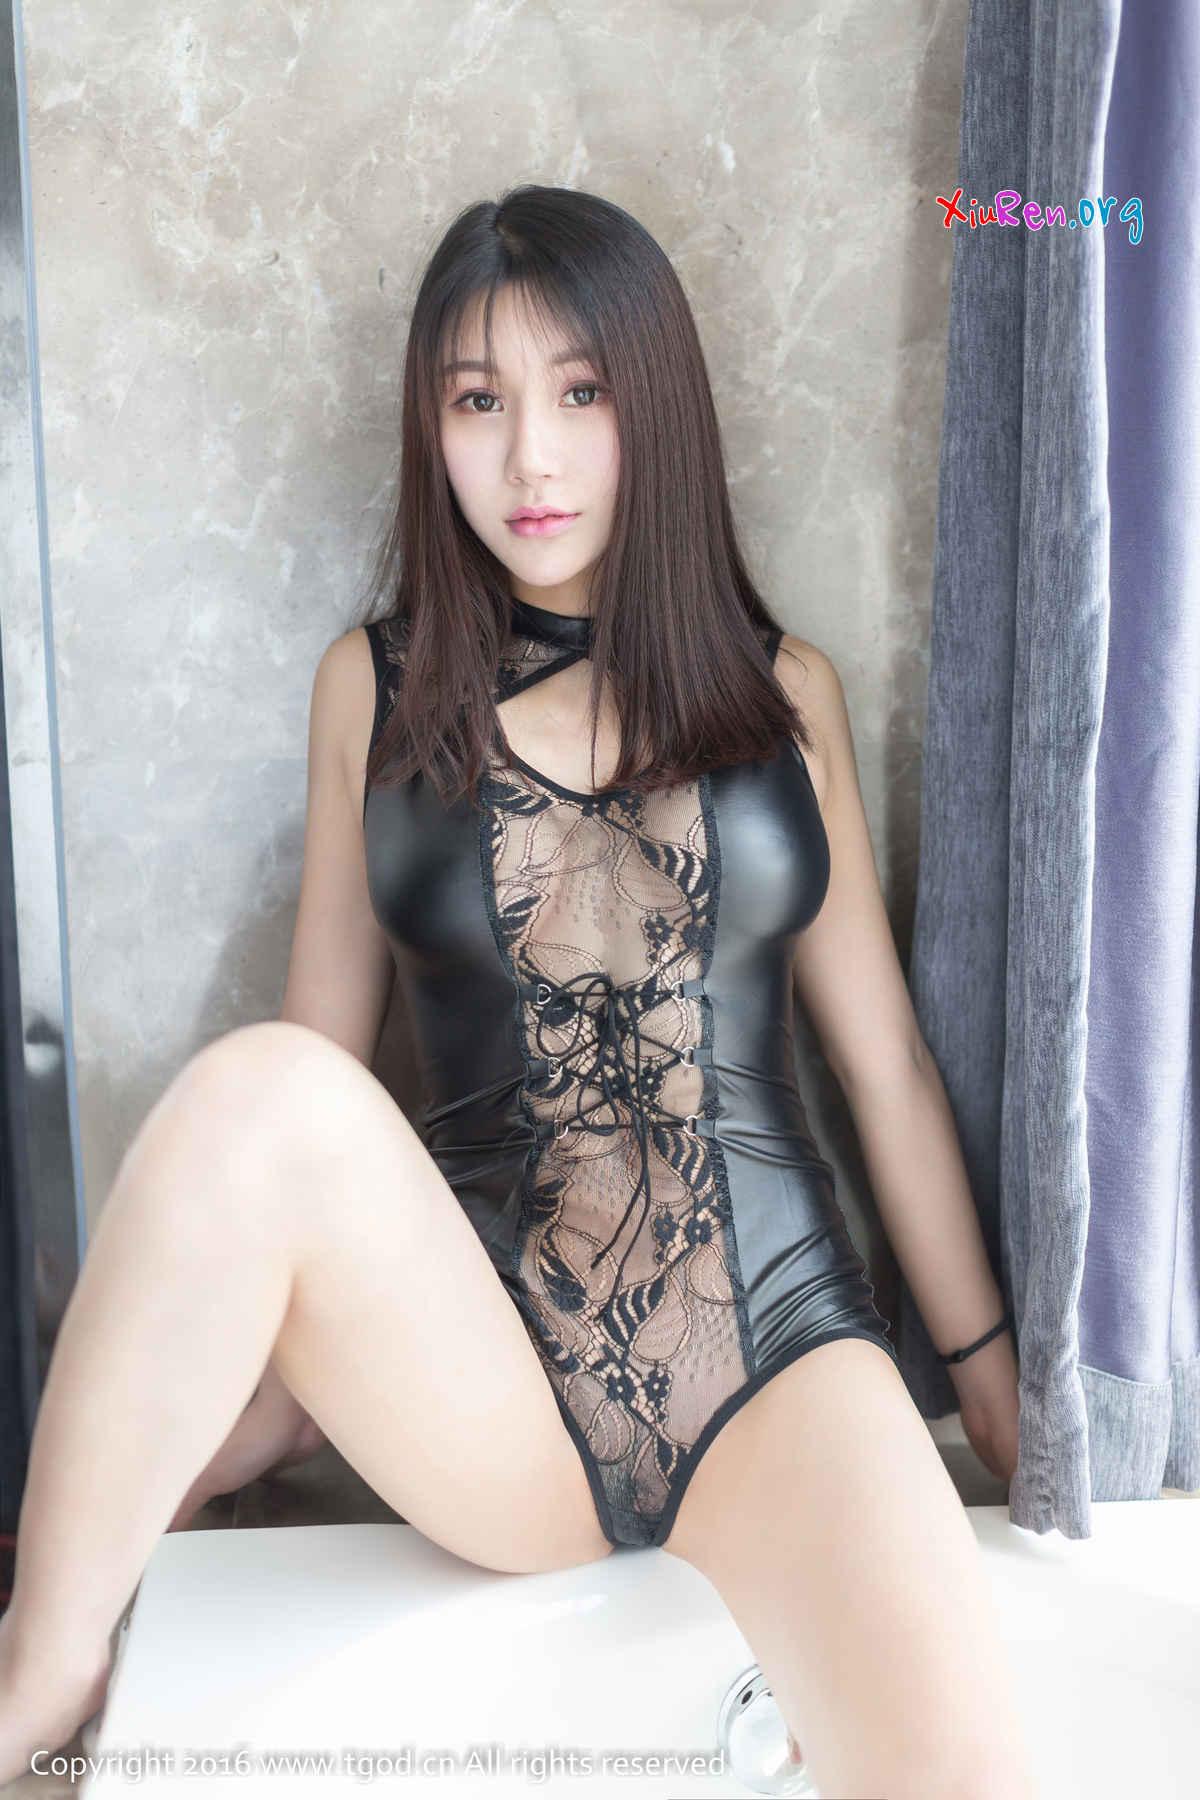 tgod-songzinuo-004-019.jpg